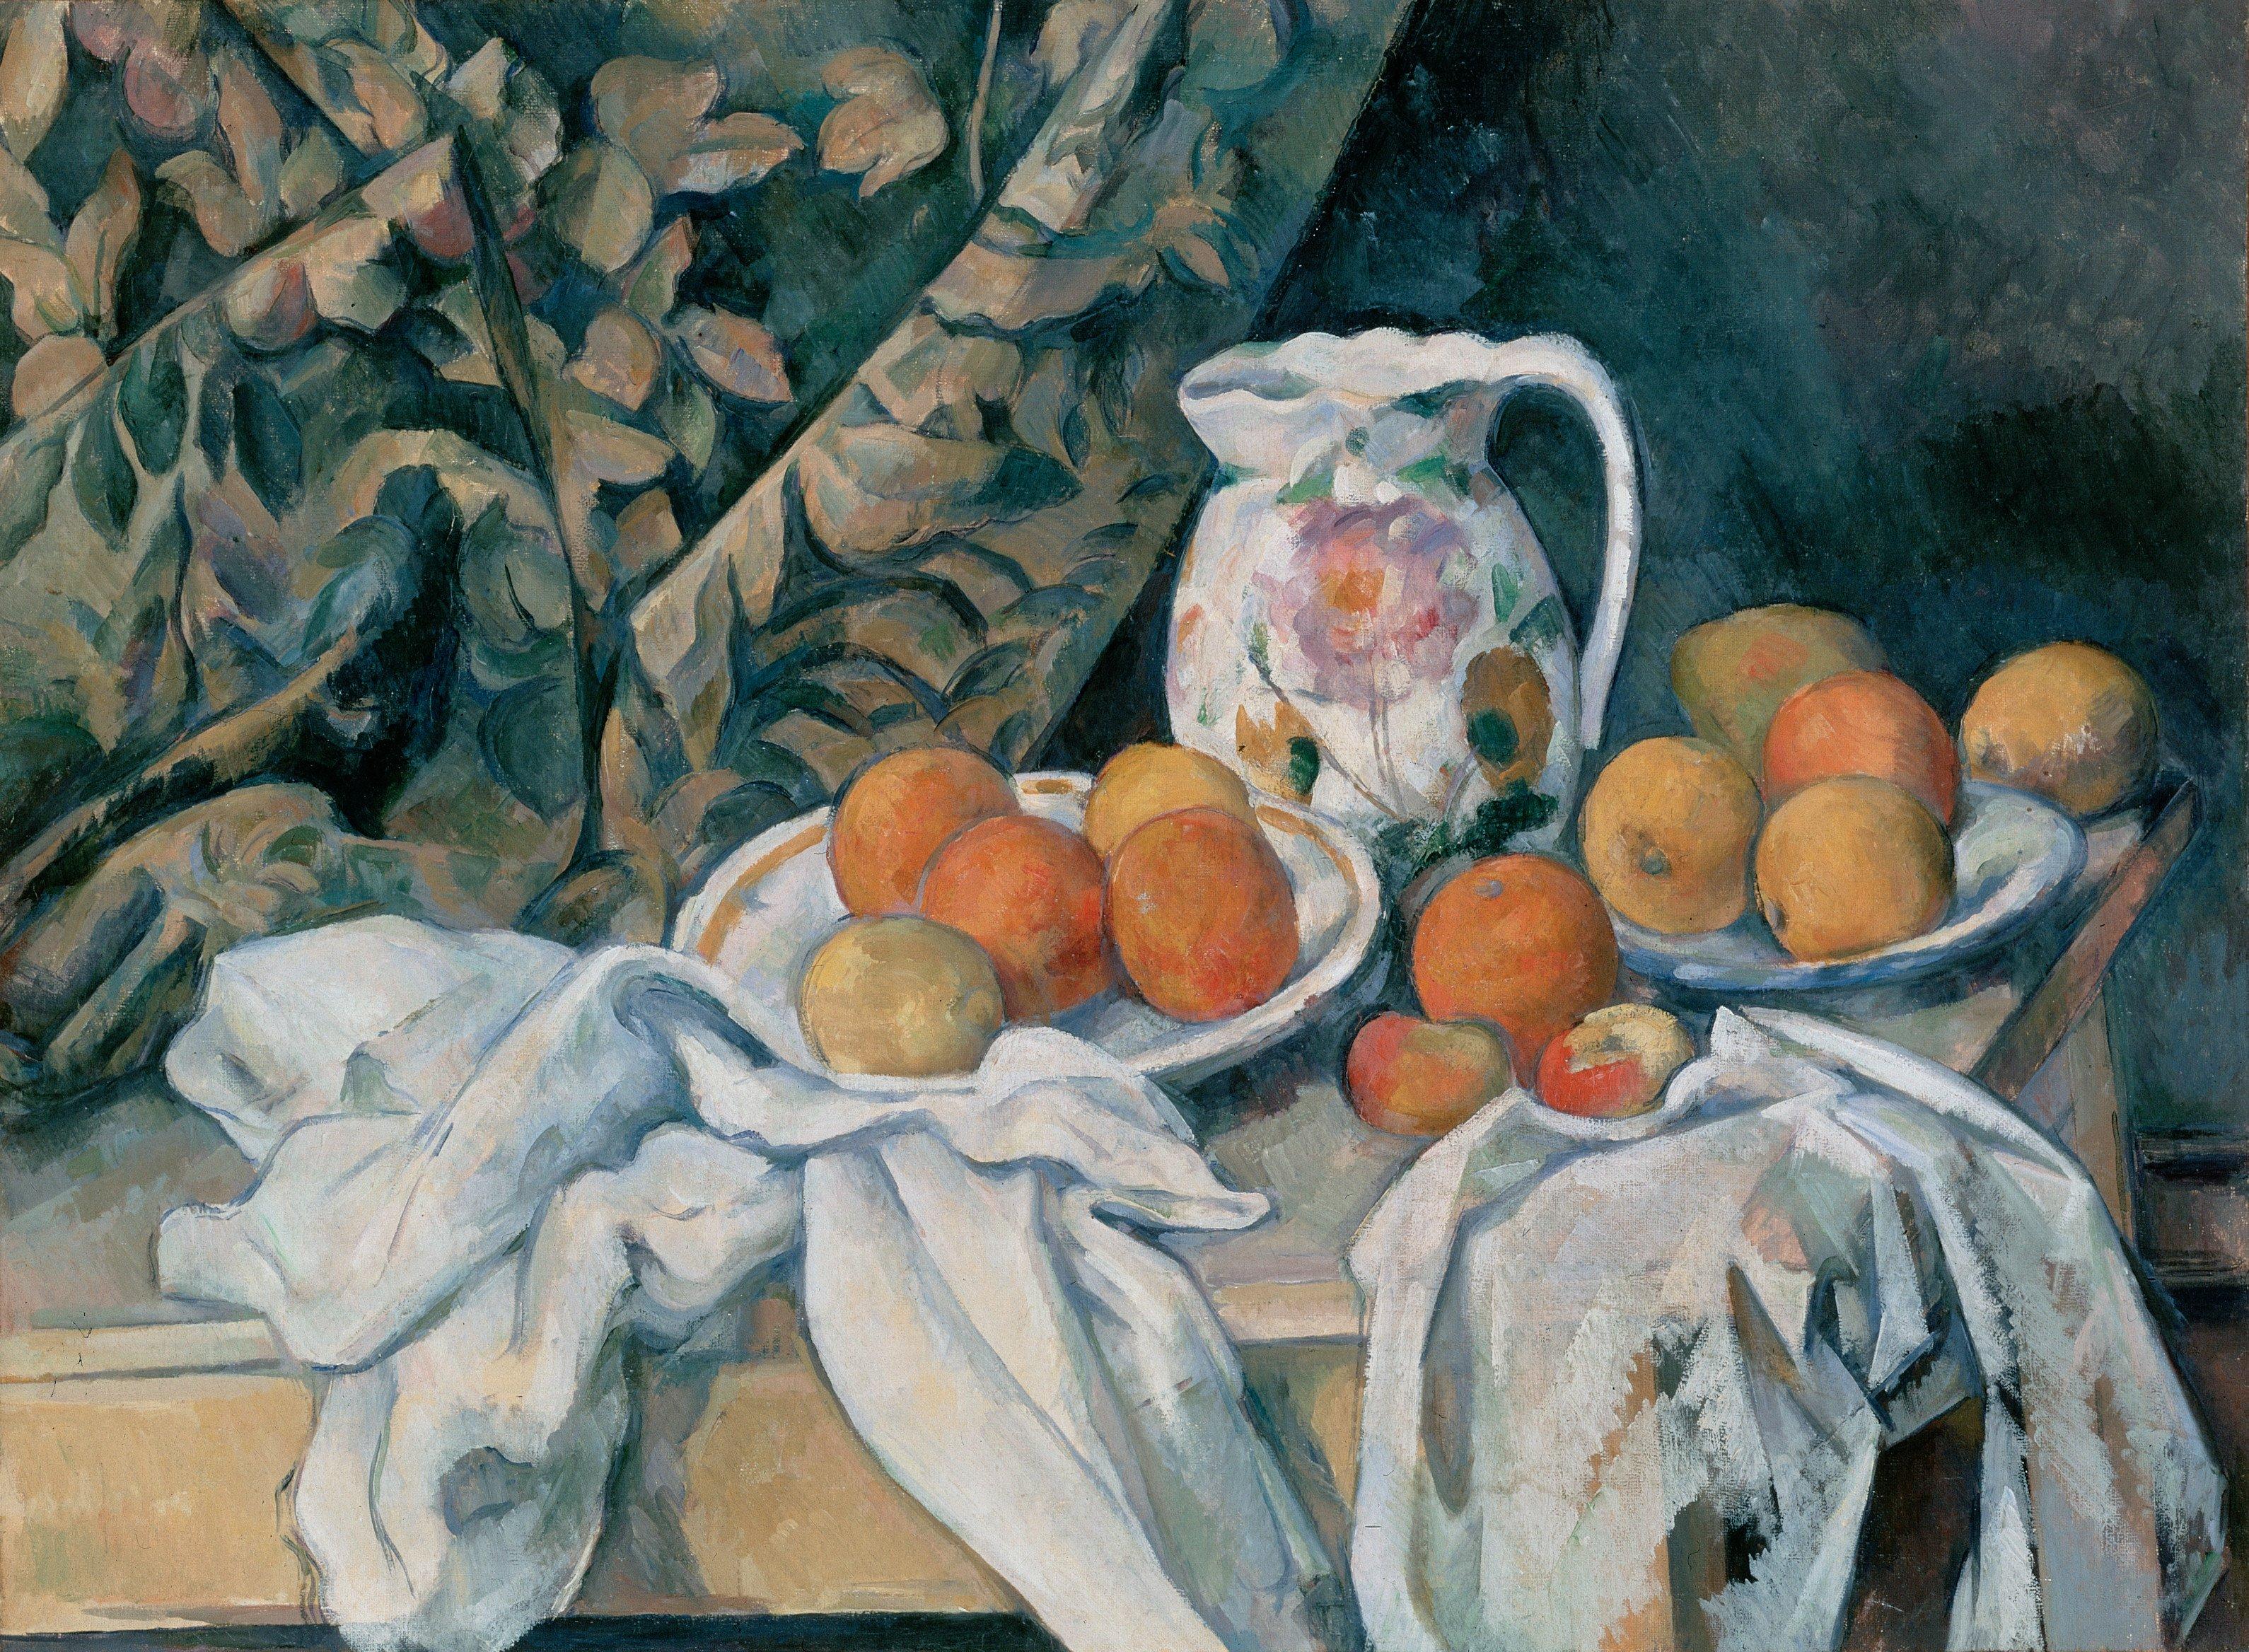 Still Life with a Curtain by Paul Cézanne